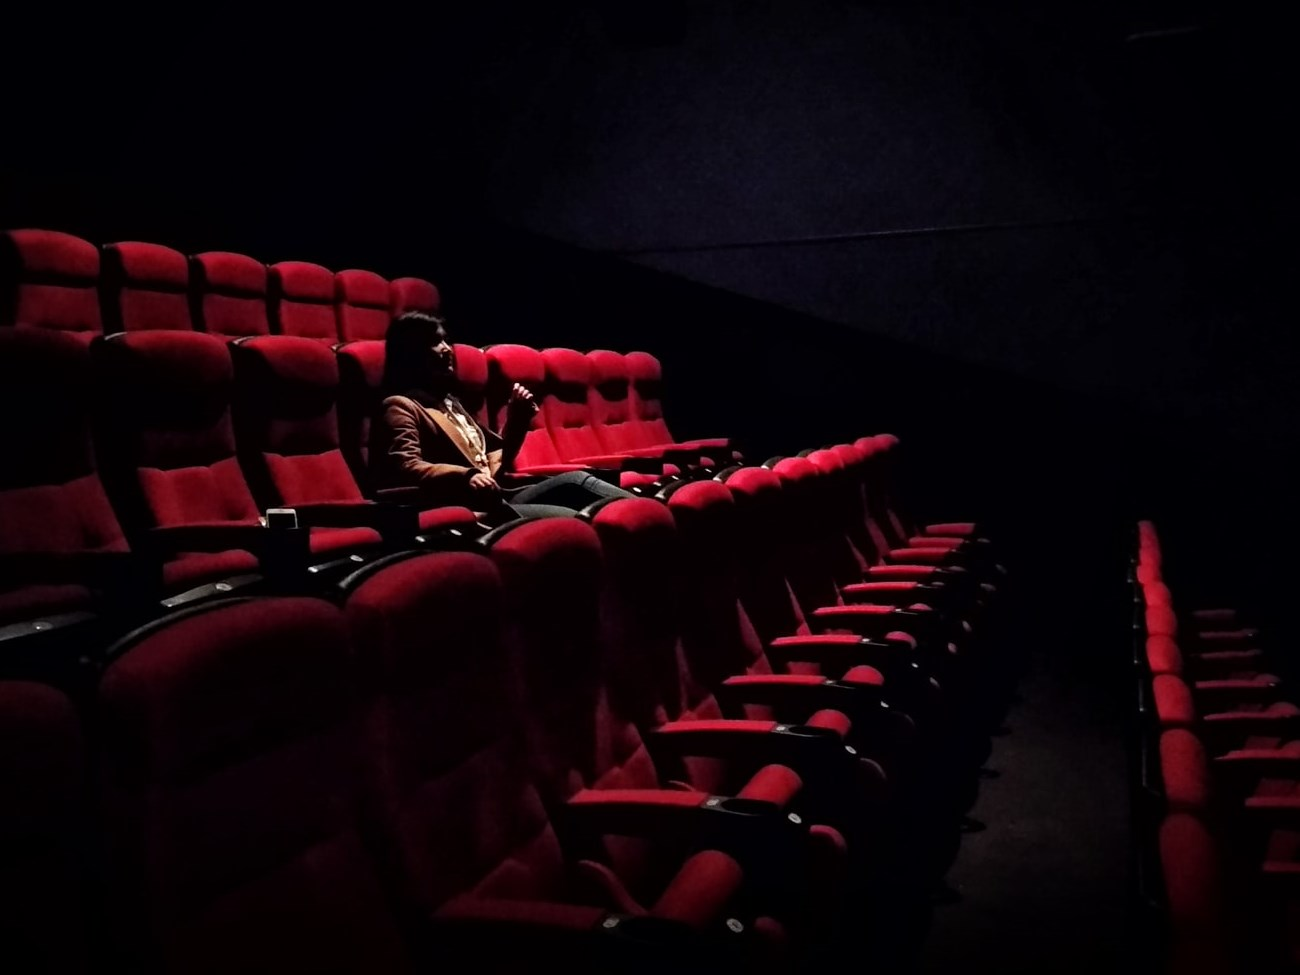 Frau allein im Kinosaal